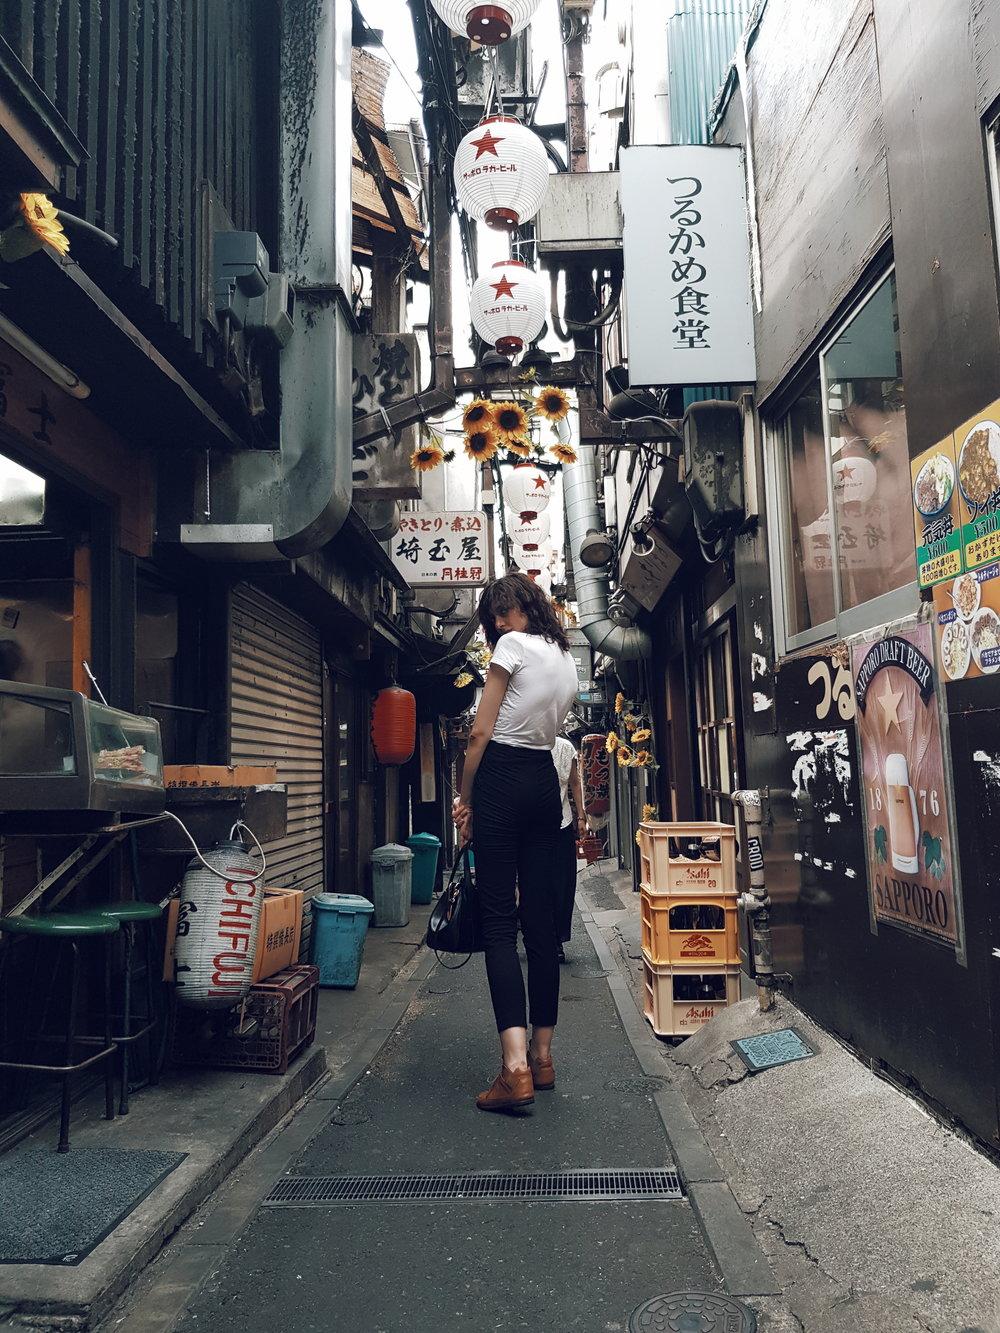 shinjuku- alley street japan- a day away.jpg